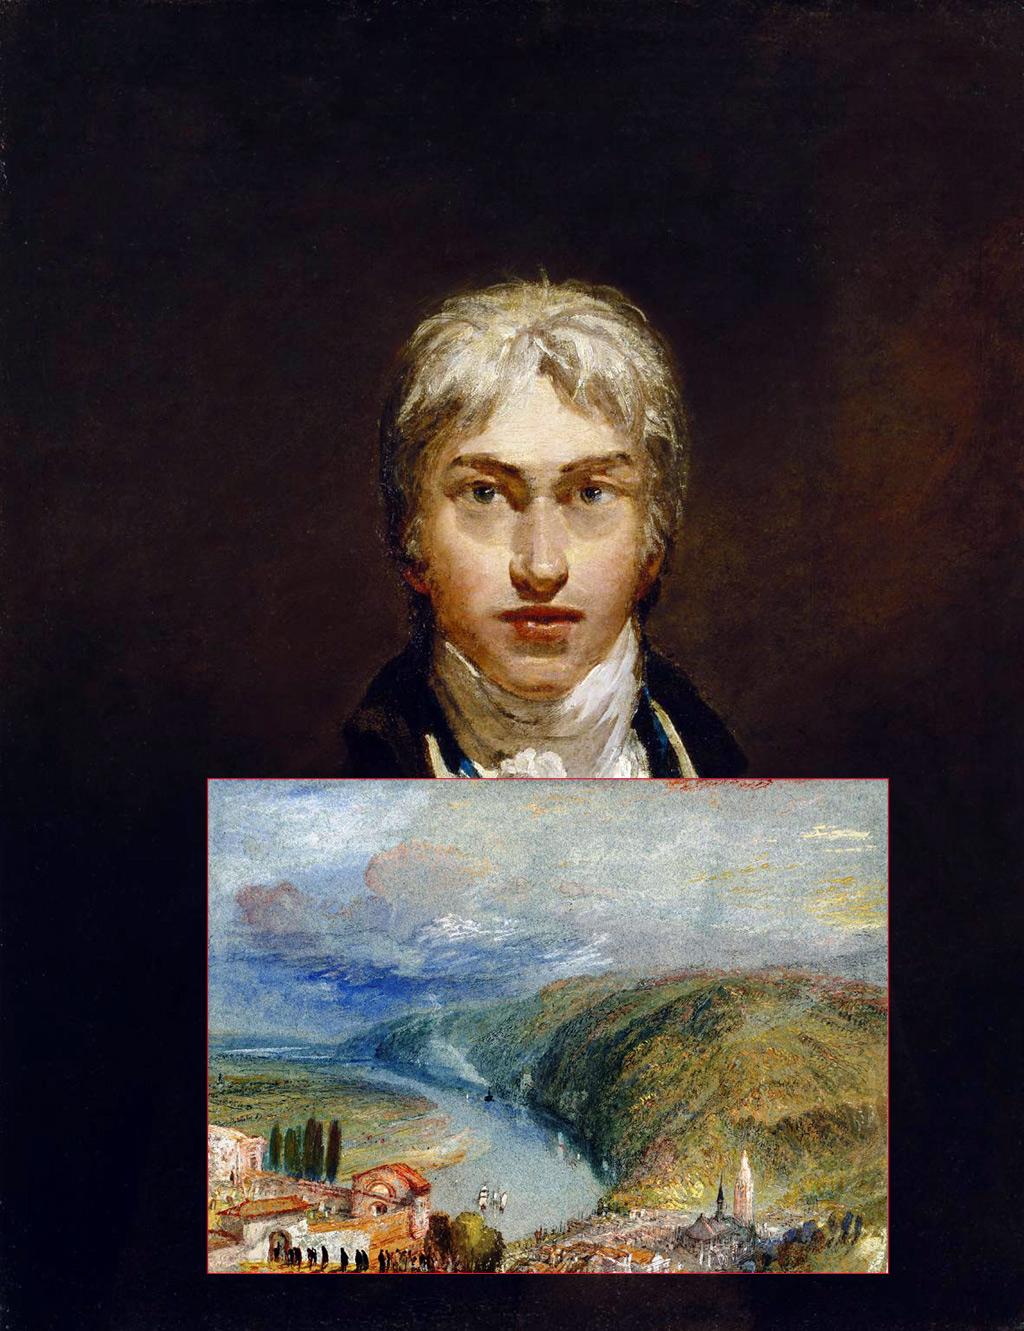 Caudebec-en-Caux – The Artists – Turner, Joseph Mallord William